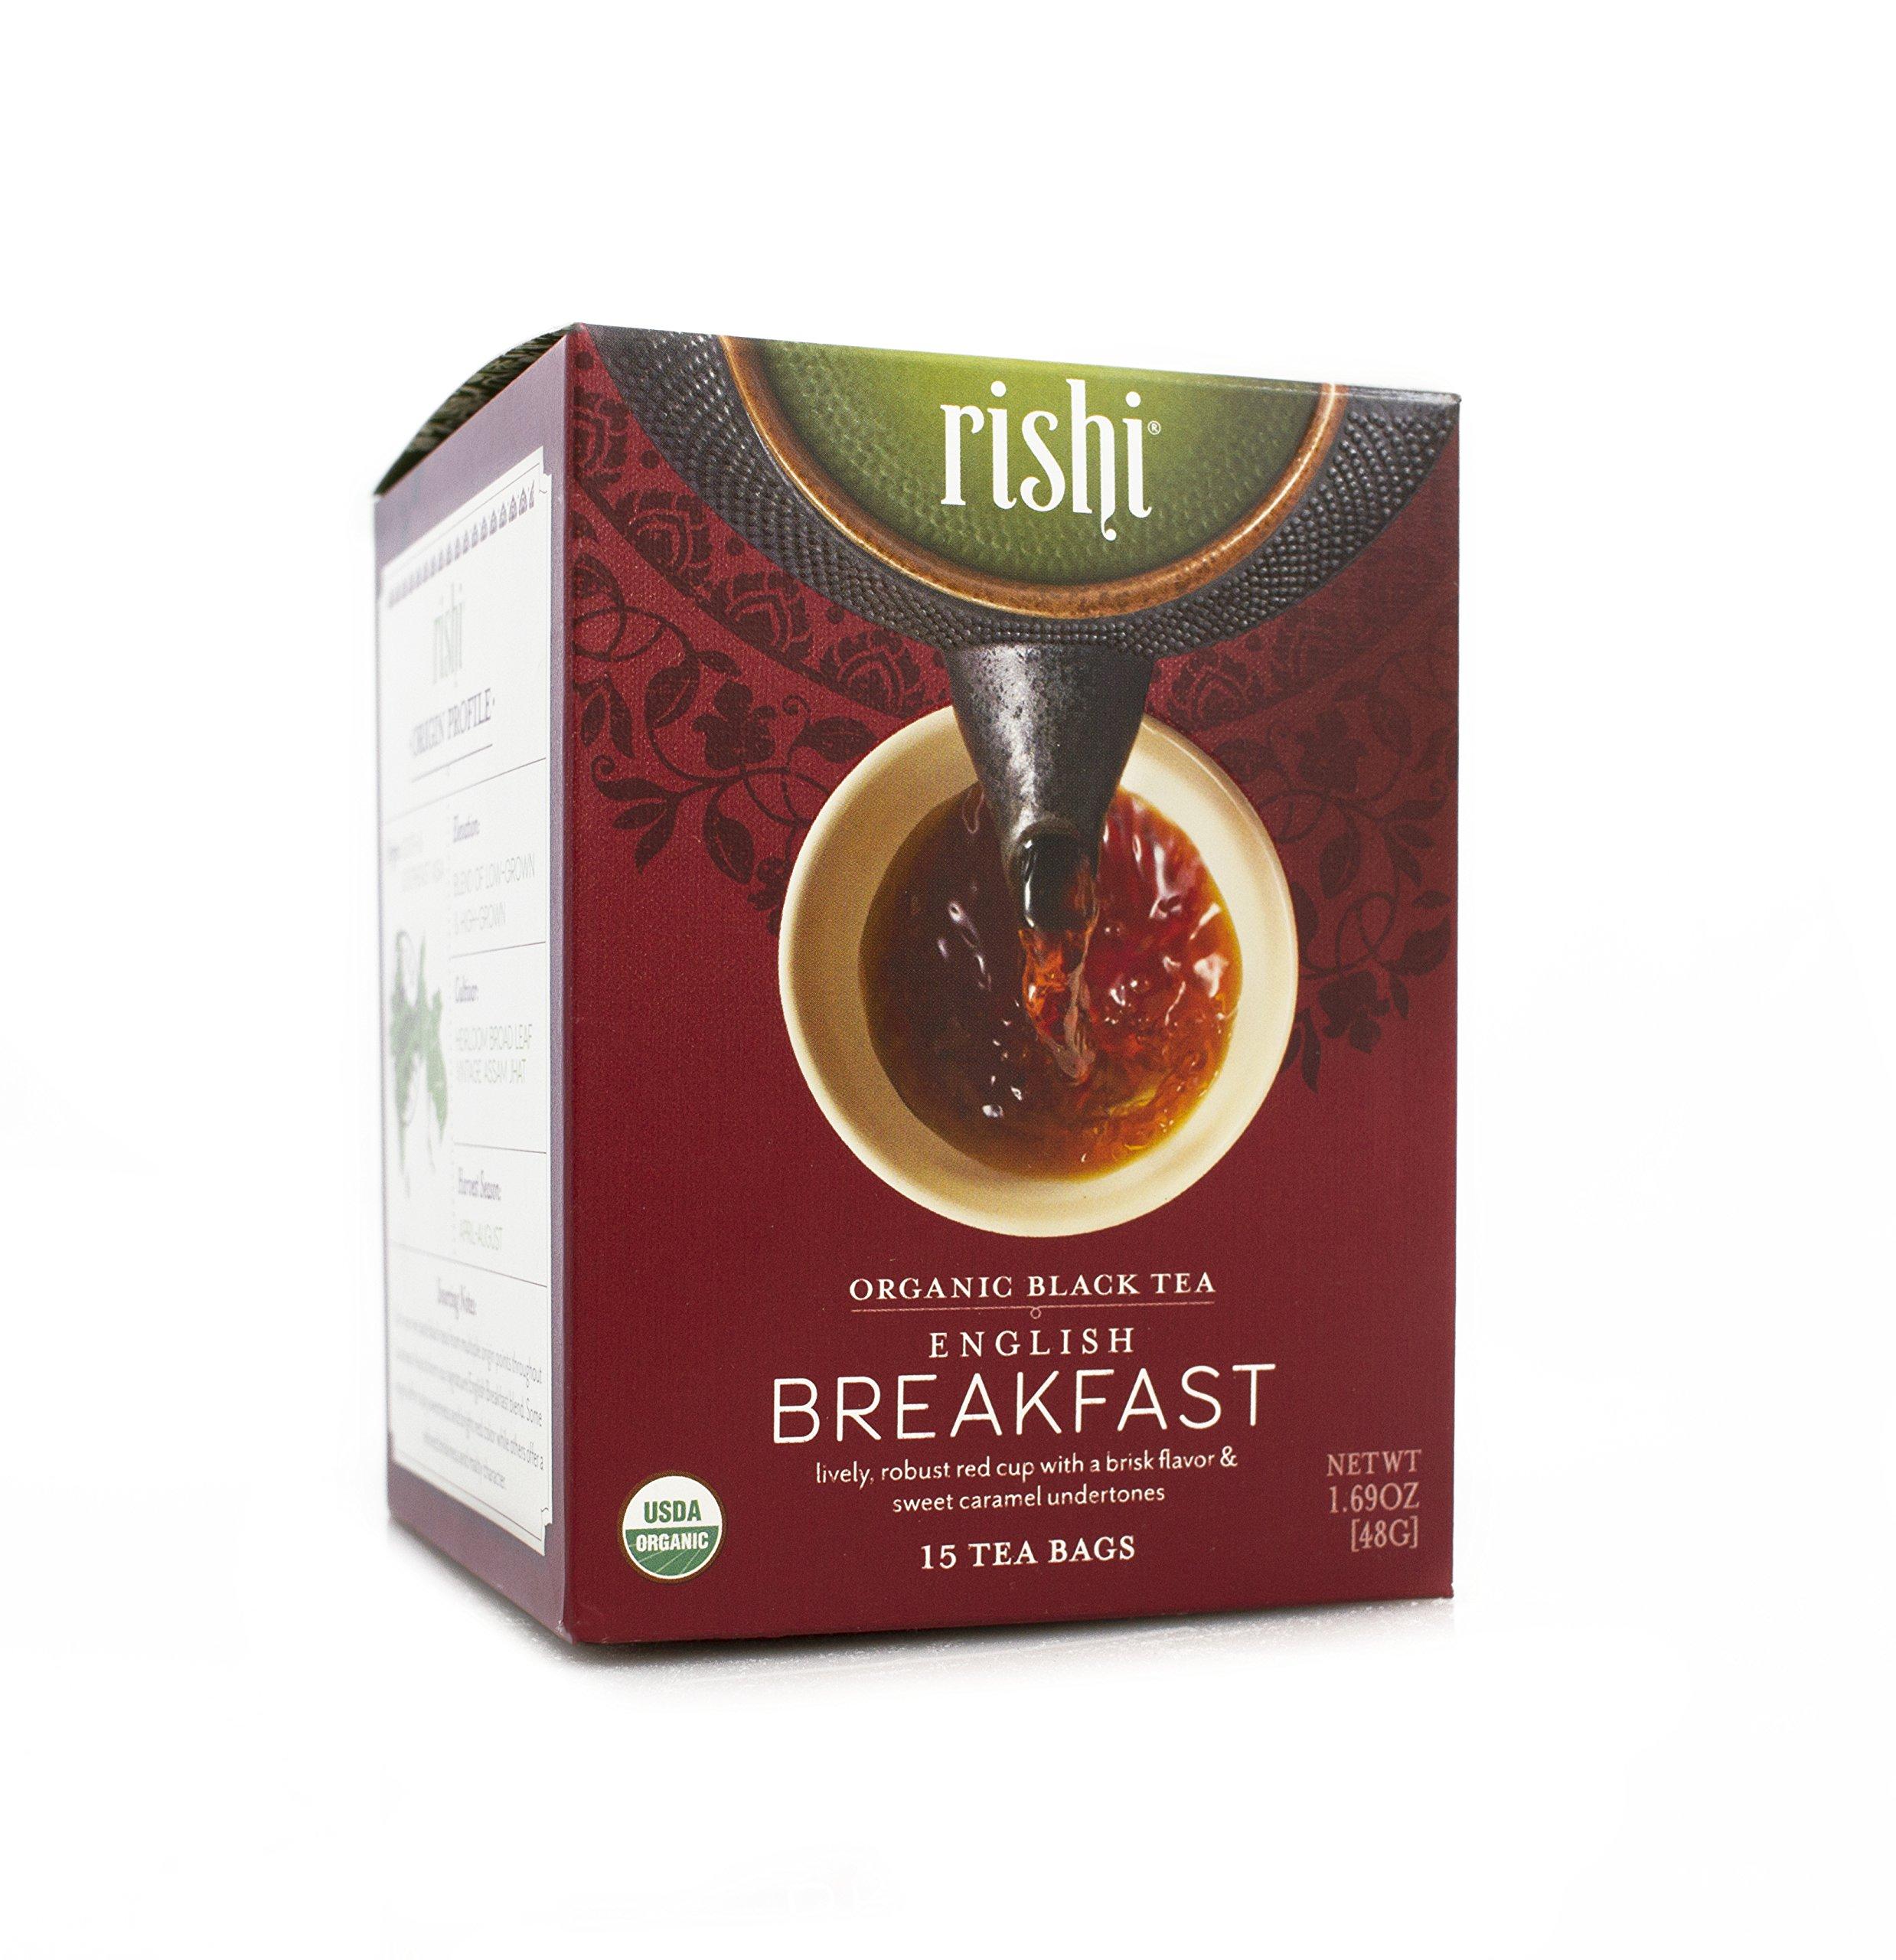 Rishi Tea Organic English Breakfast Tea Bags, 15 Count (Pack of 6) by Rishi Tea